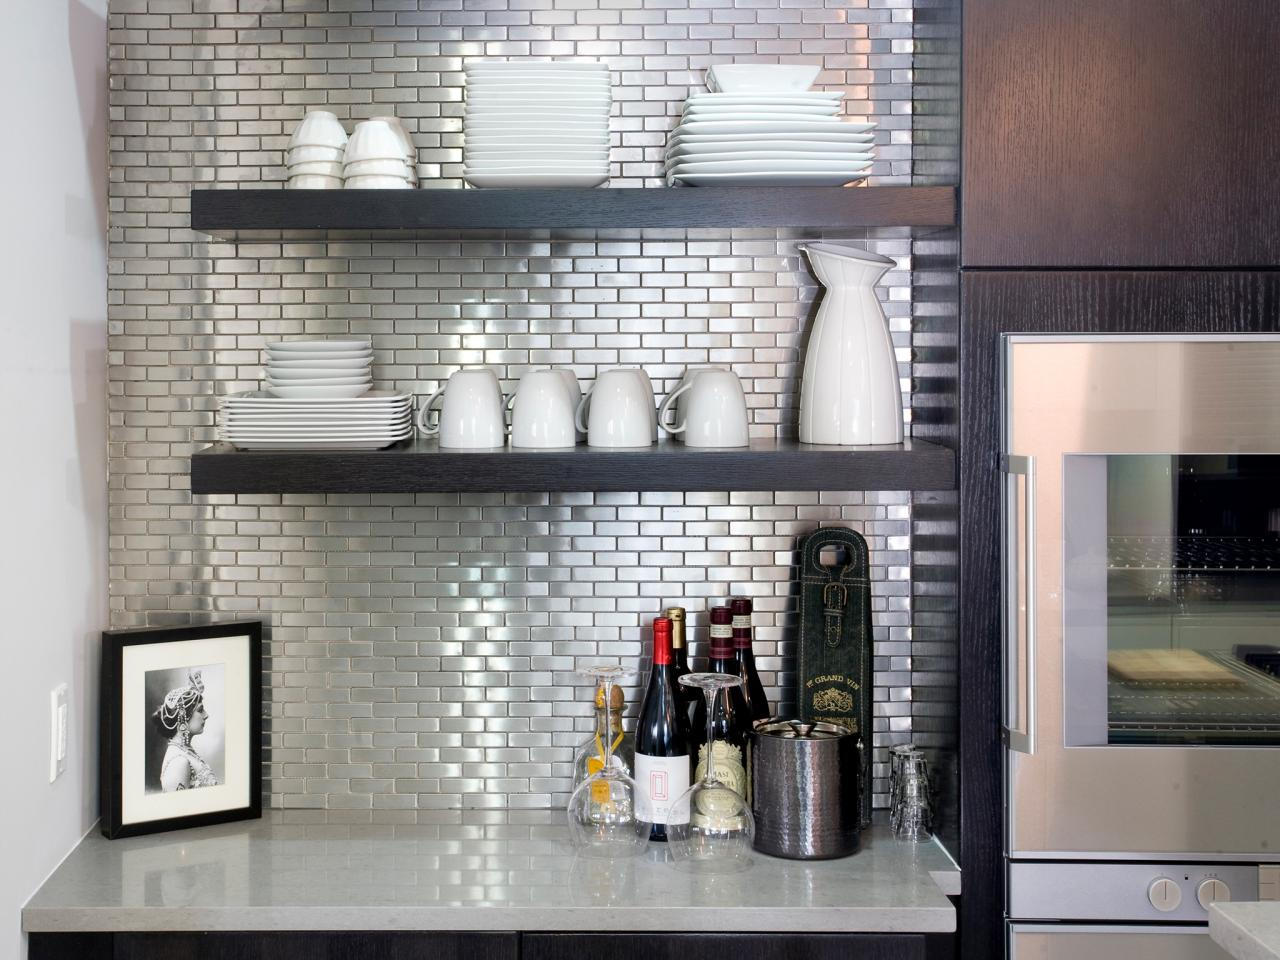 Backsplash Design Ideas image of kitchen backsplash design ideas Ceramic Tile Backsplash